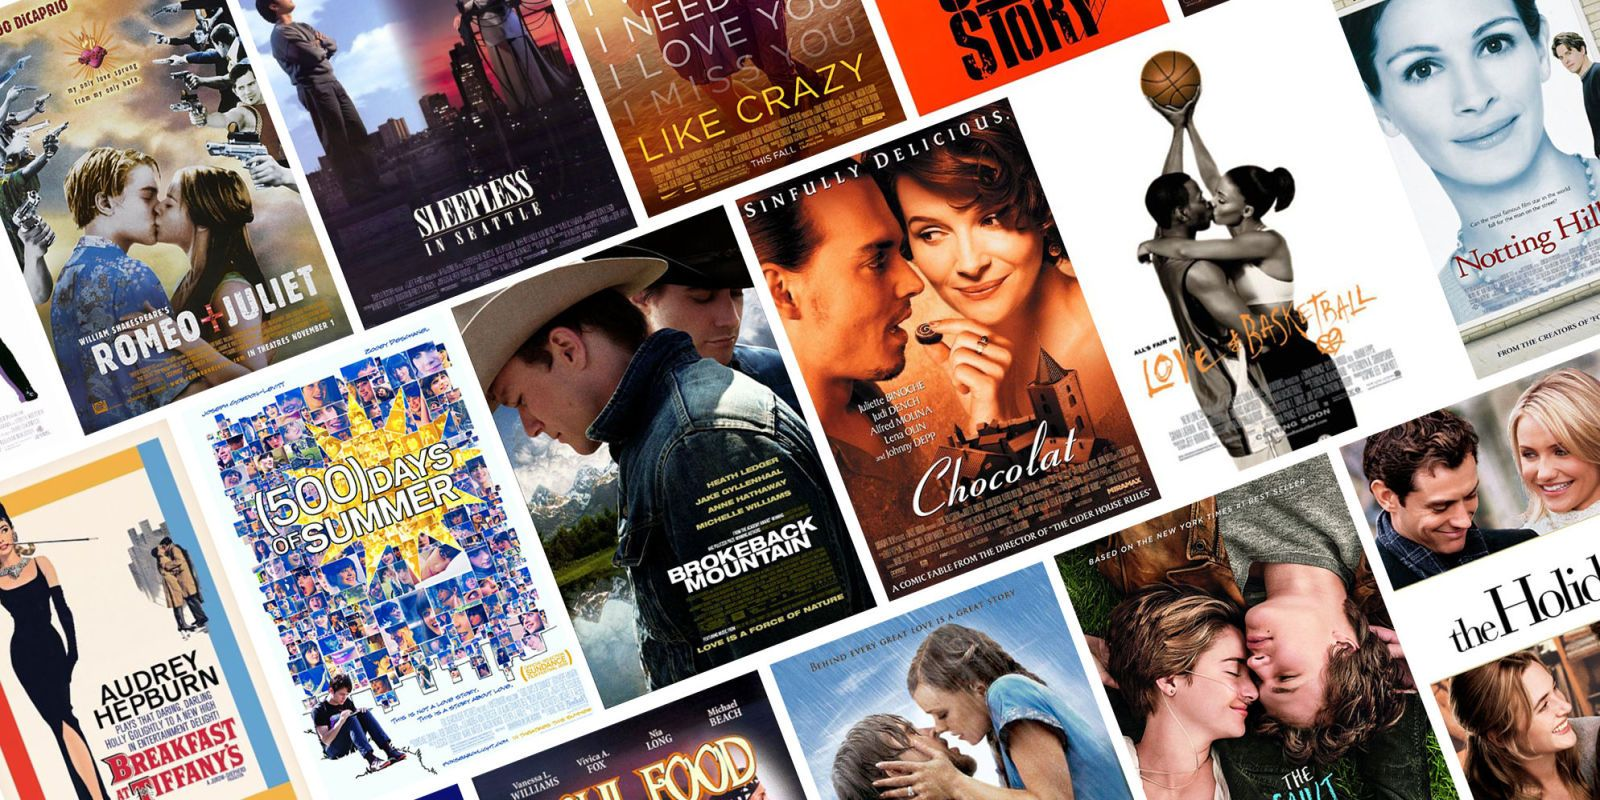 Feel good love movies